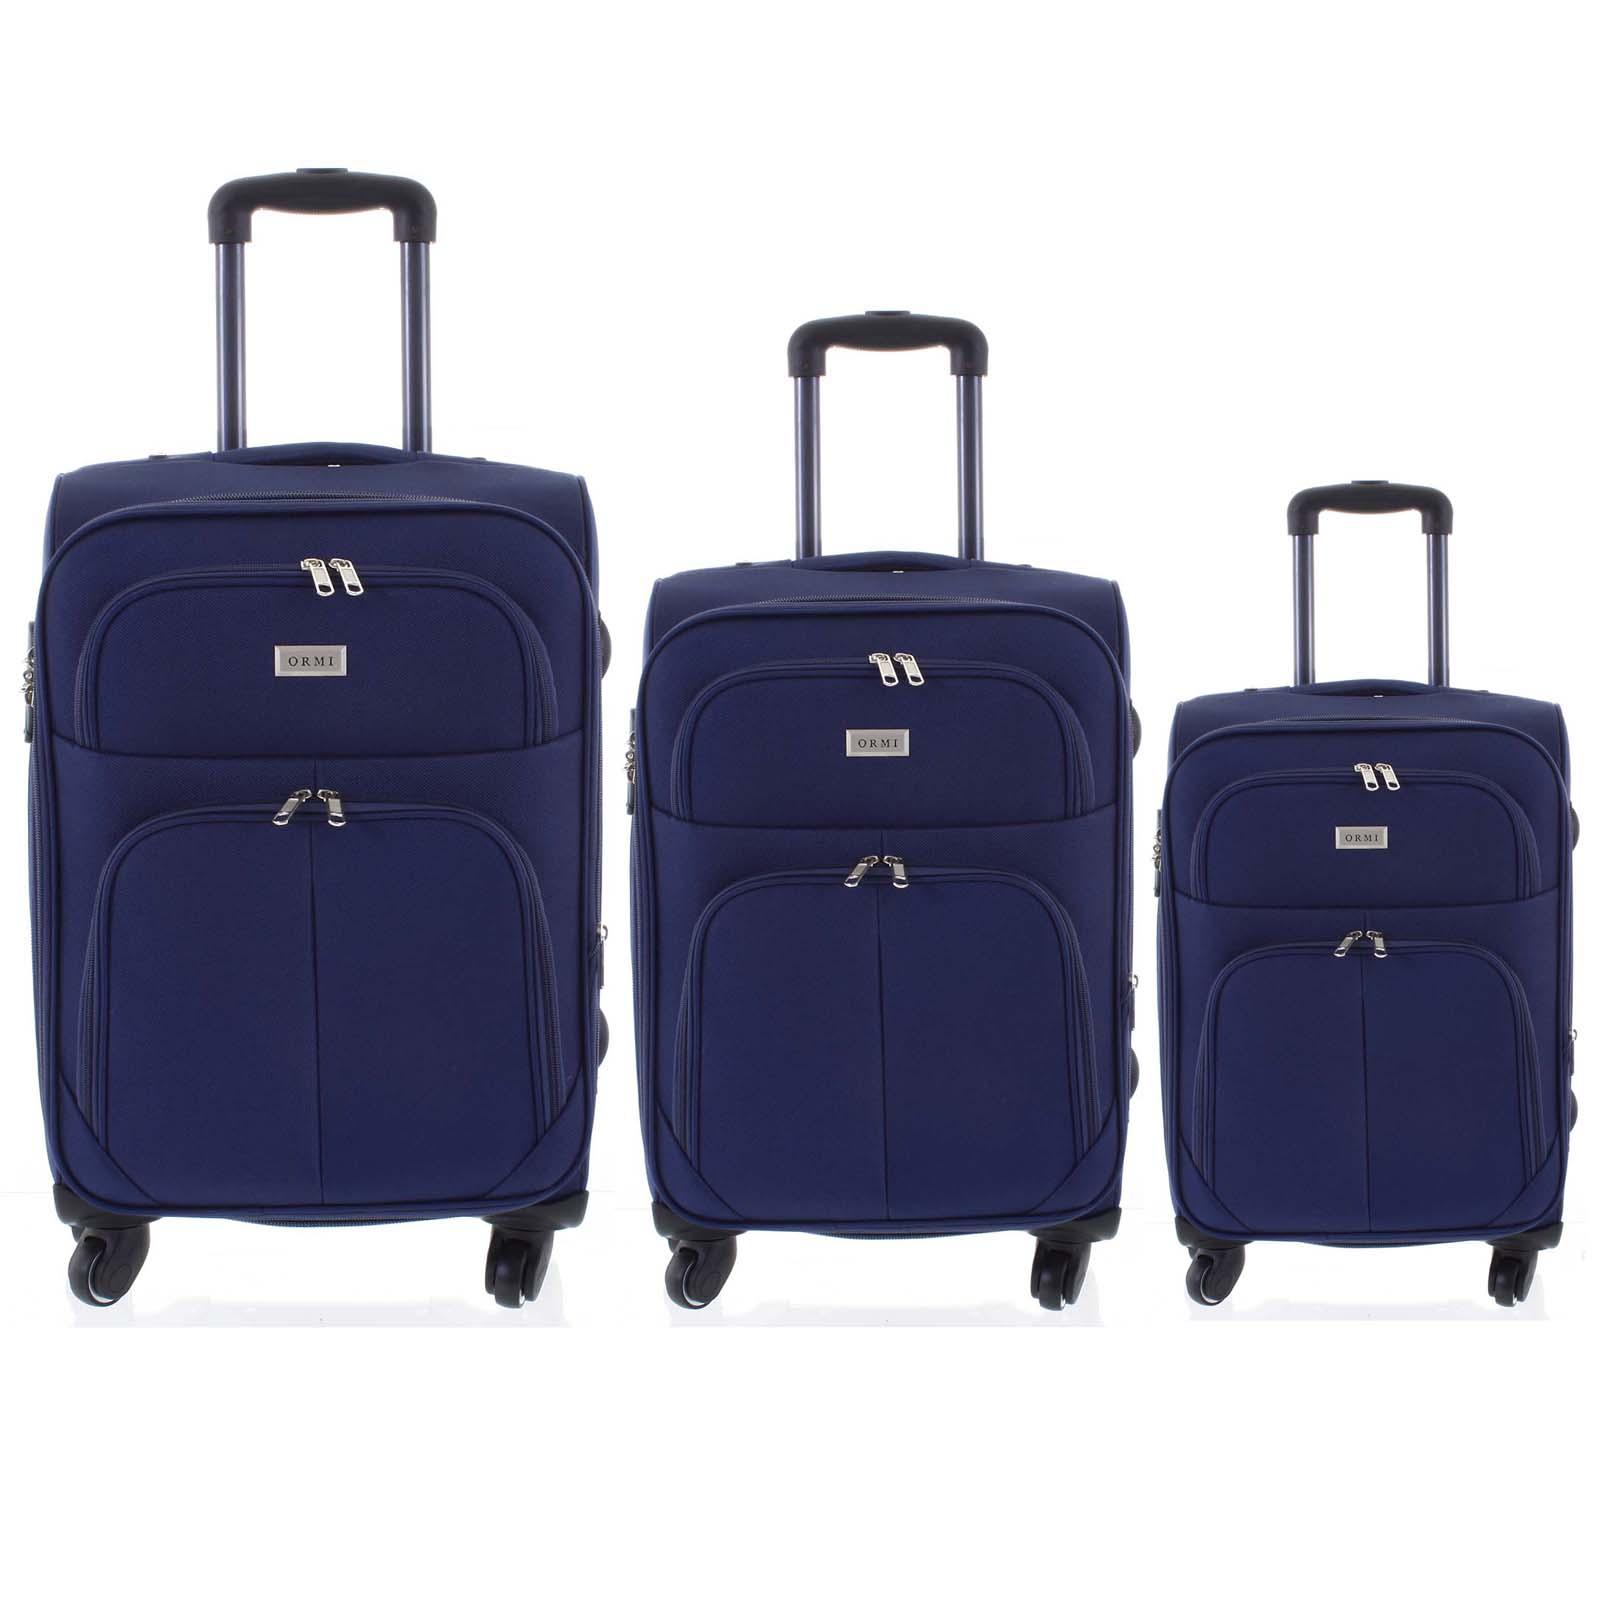 Cestovný kufor modrý sada - Ormi Tessa S, M, L